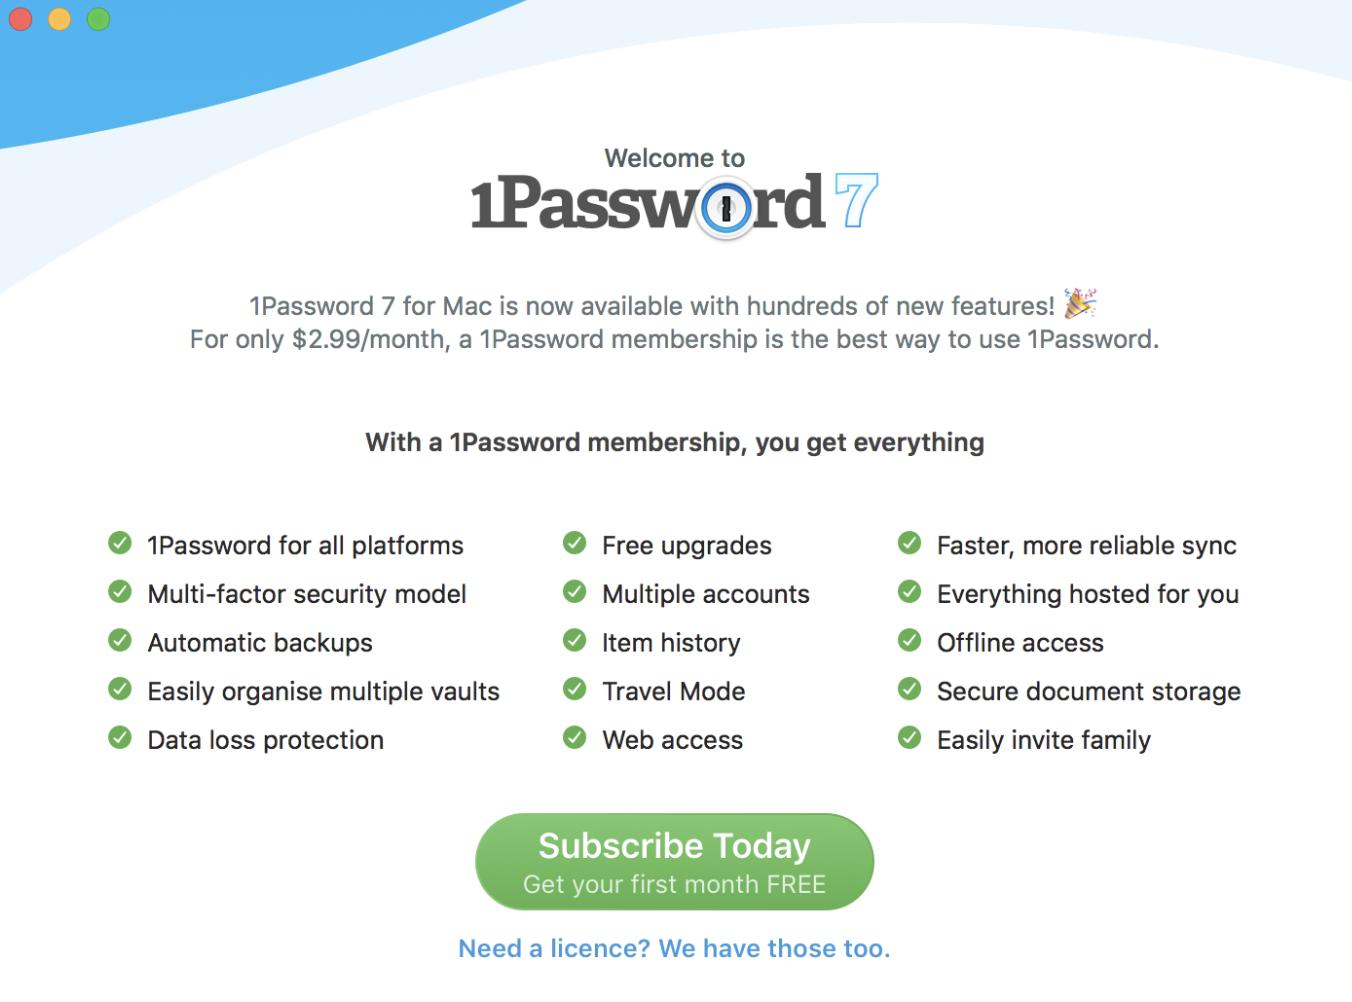 1password standalone family license